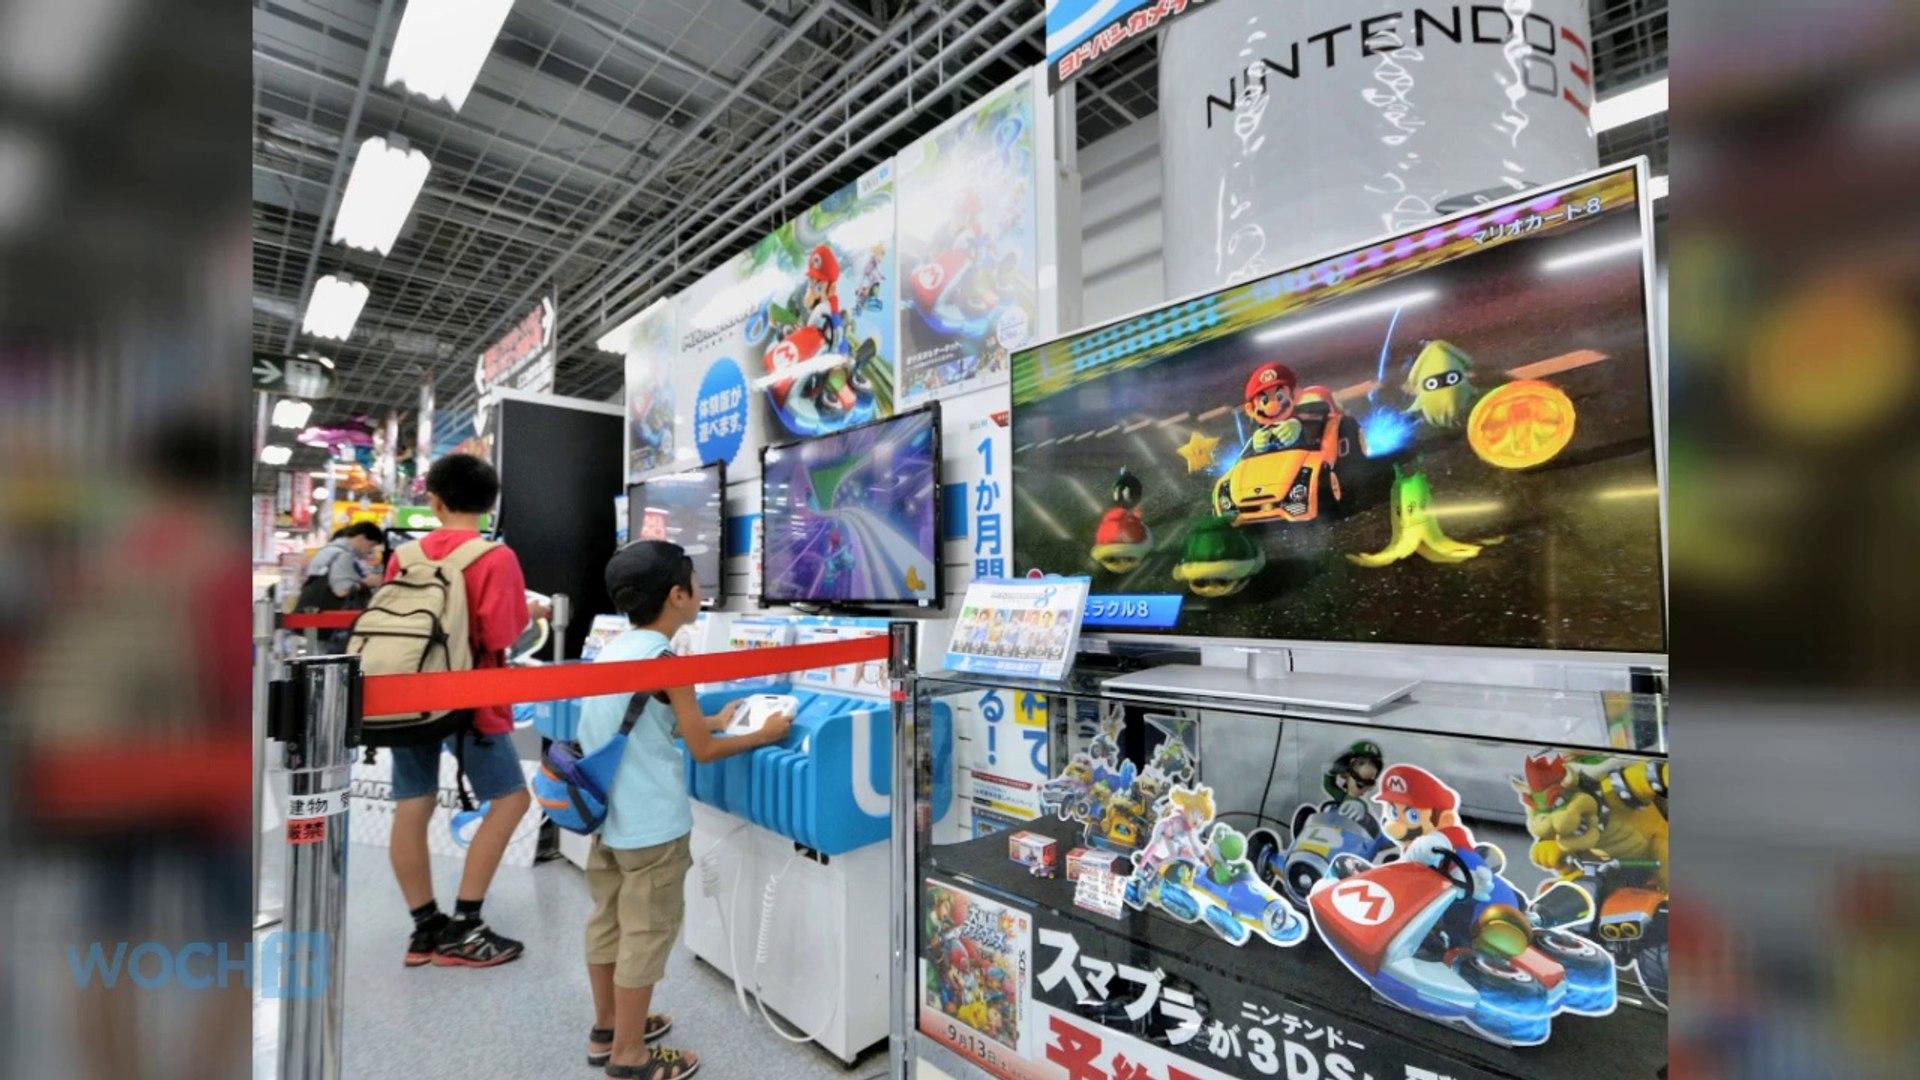 Nintendo Reports Loss On Shaky Wii U Sales